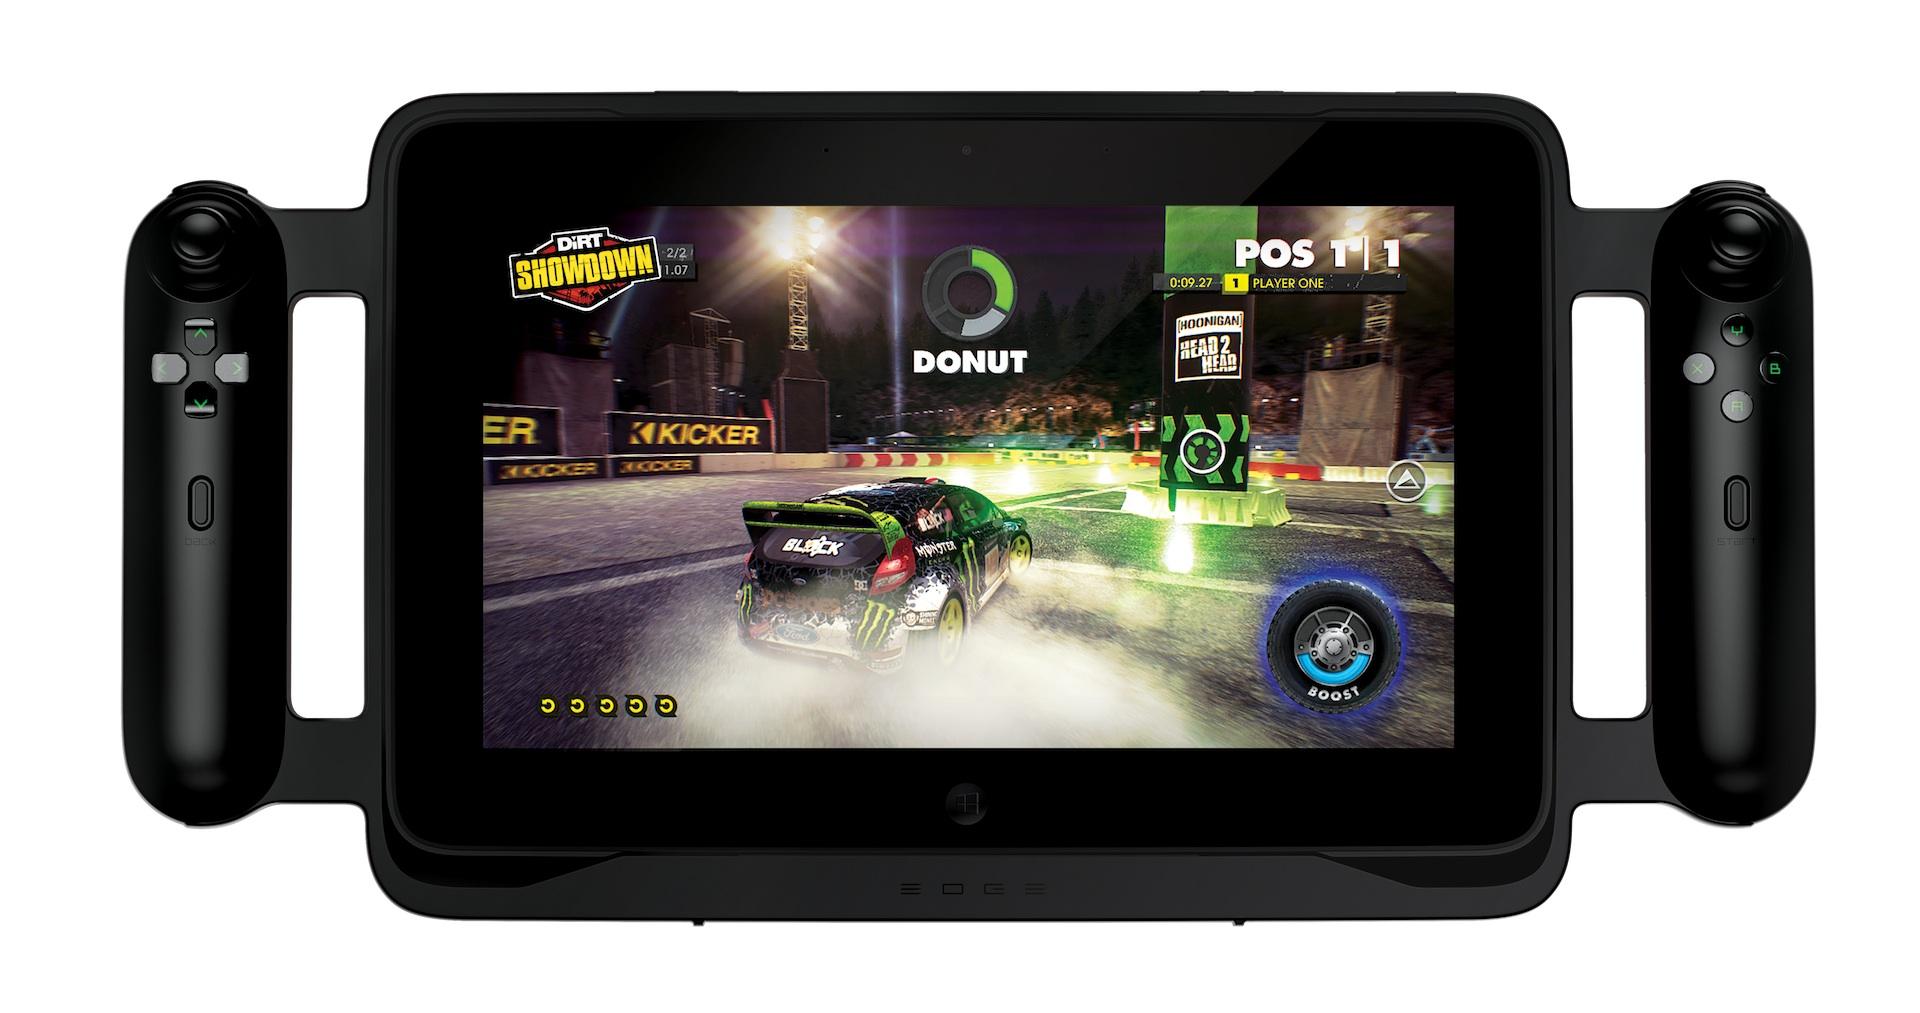 Razer Edge: Gaming-Tablet mit Controller, Keyboard und Dock angespielt - Razer Edge - mit Controller-Rahmen (Bild: Razer)